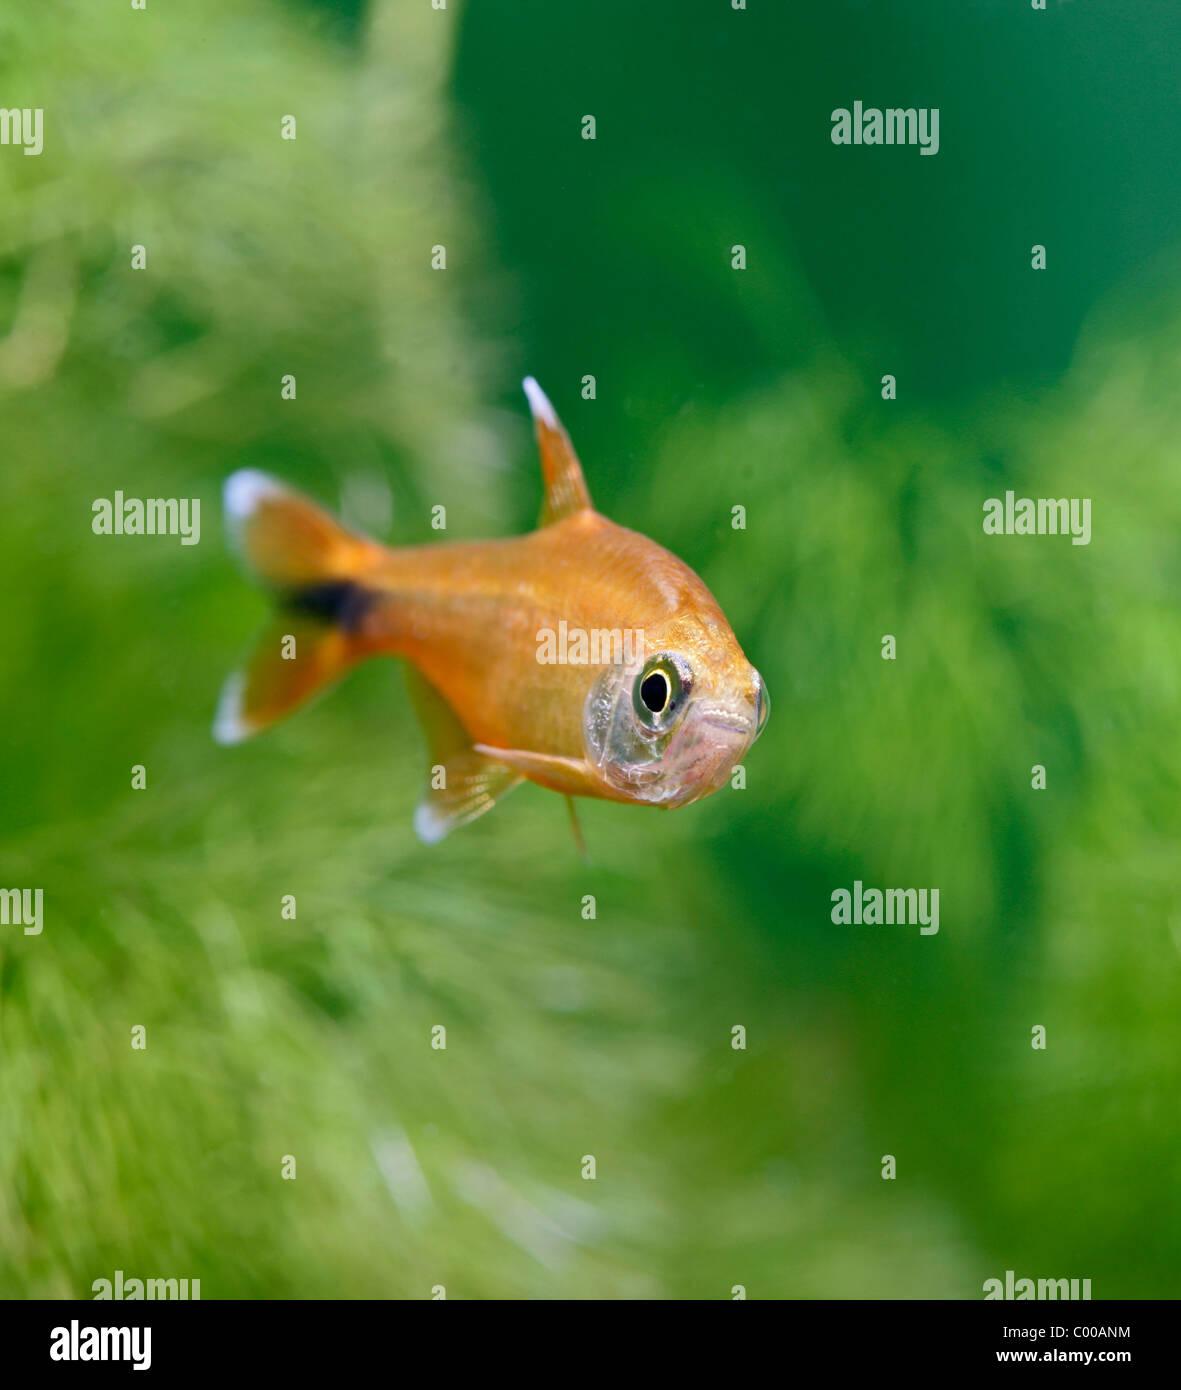 Tropical Freshwater Aquarium Stock Photos & Tropical Freshwater ...